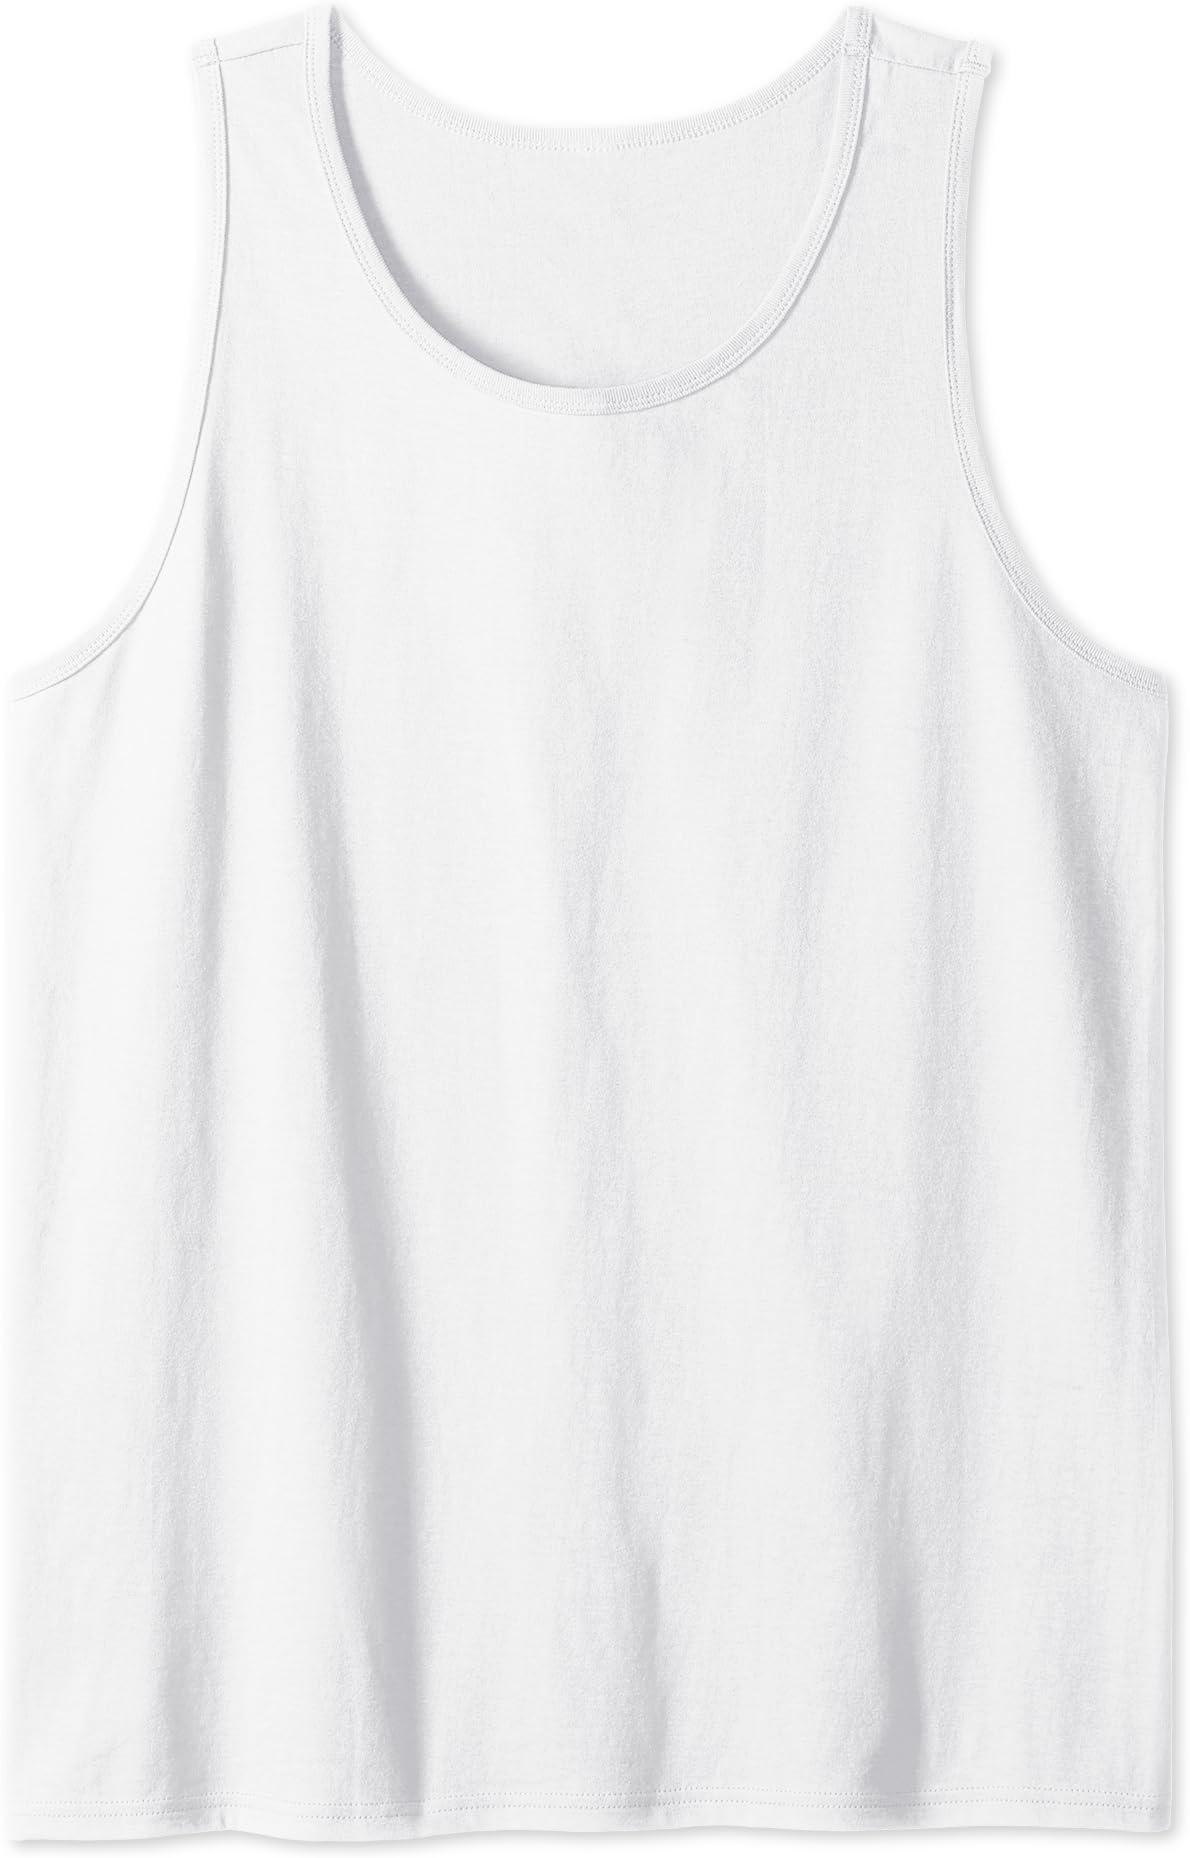 2XL San Diego State University Aztecs SDSU NCAA Cotton Logo Practice T-Shirt S